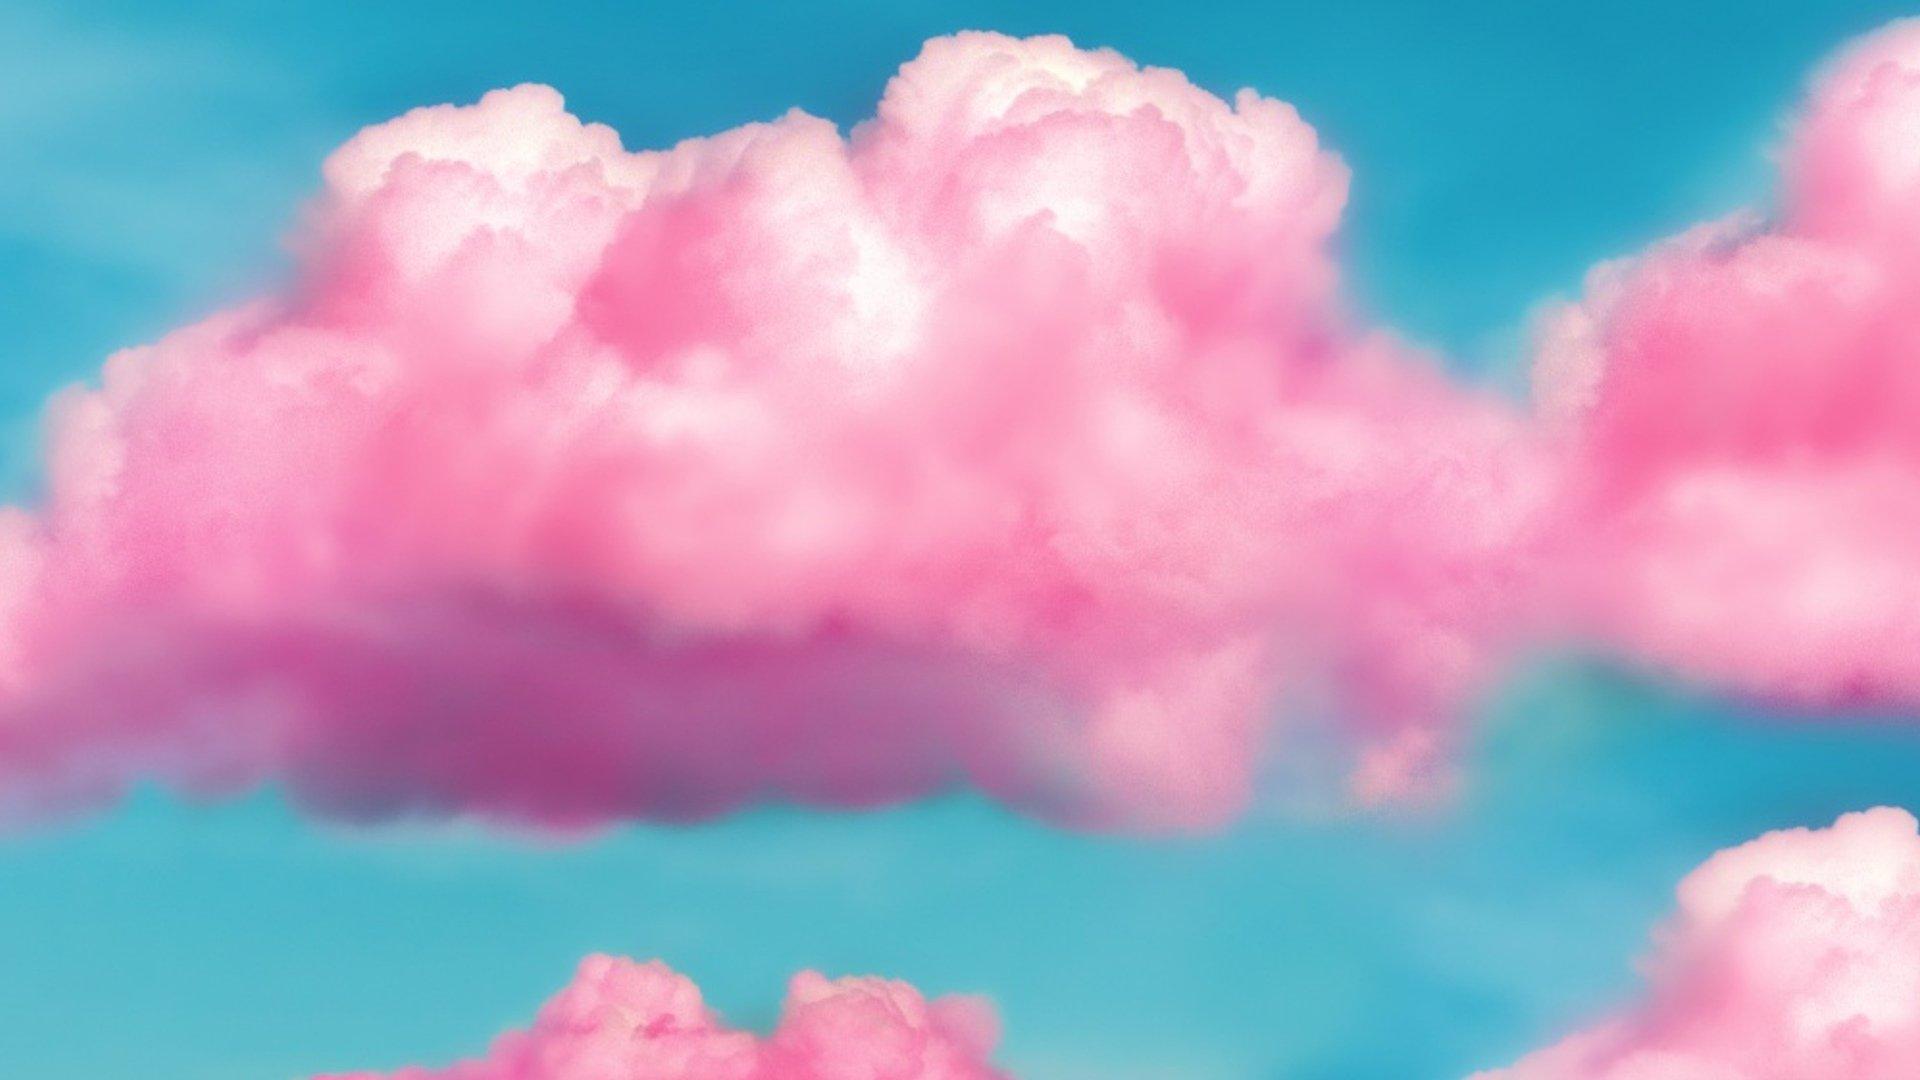 Pink Sky 1080p Wallpaper